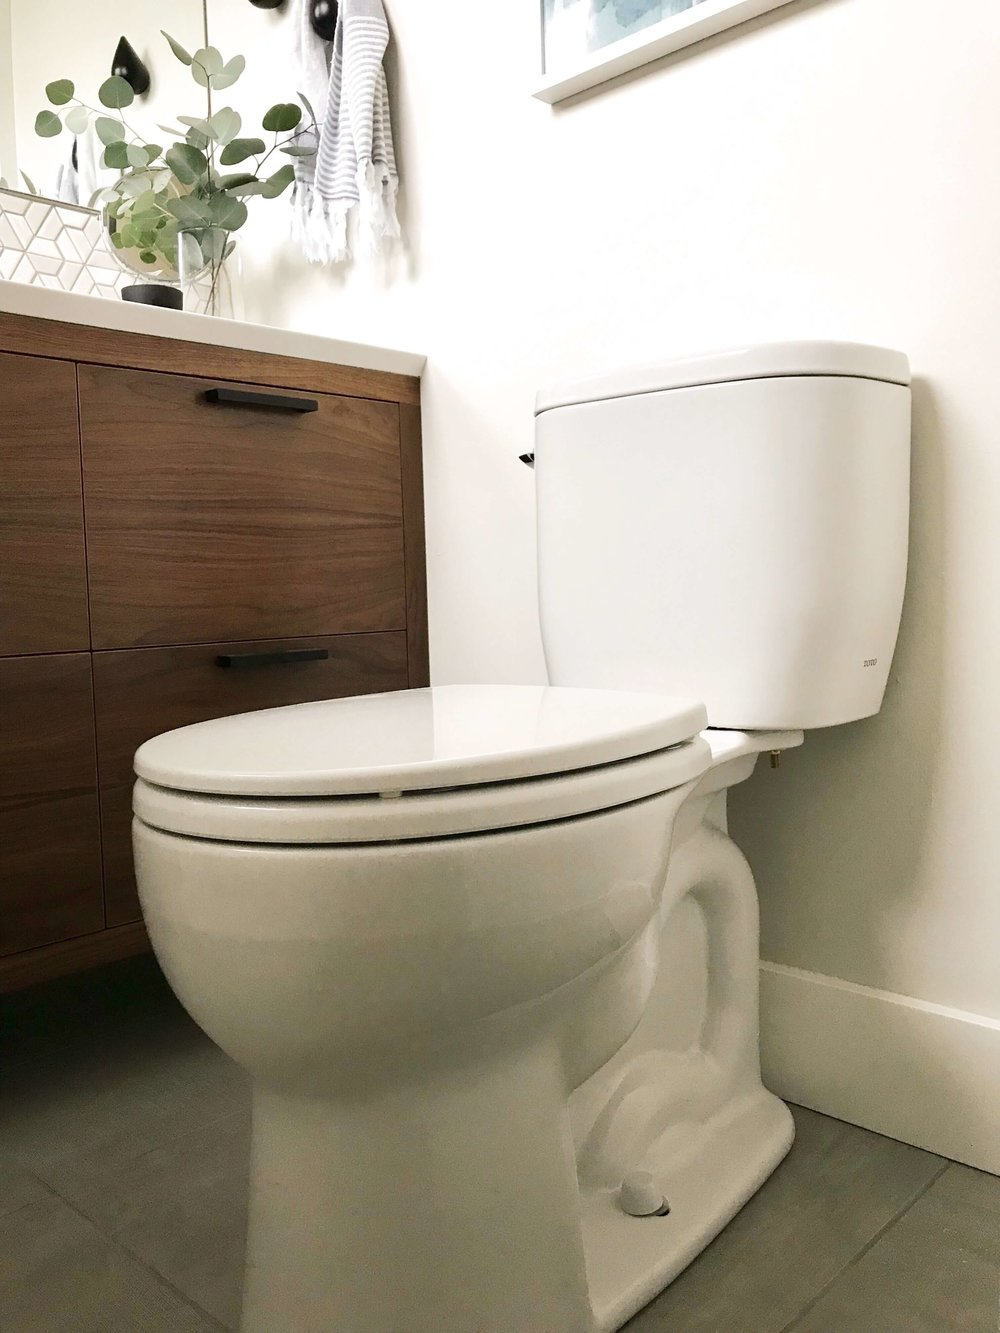 Small Bathroom Design Modern Mid Century Entrada Toilet.jpg